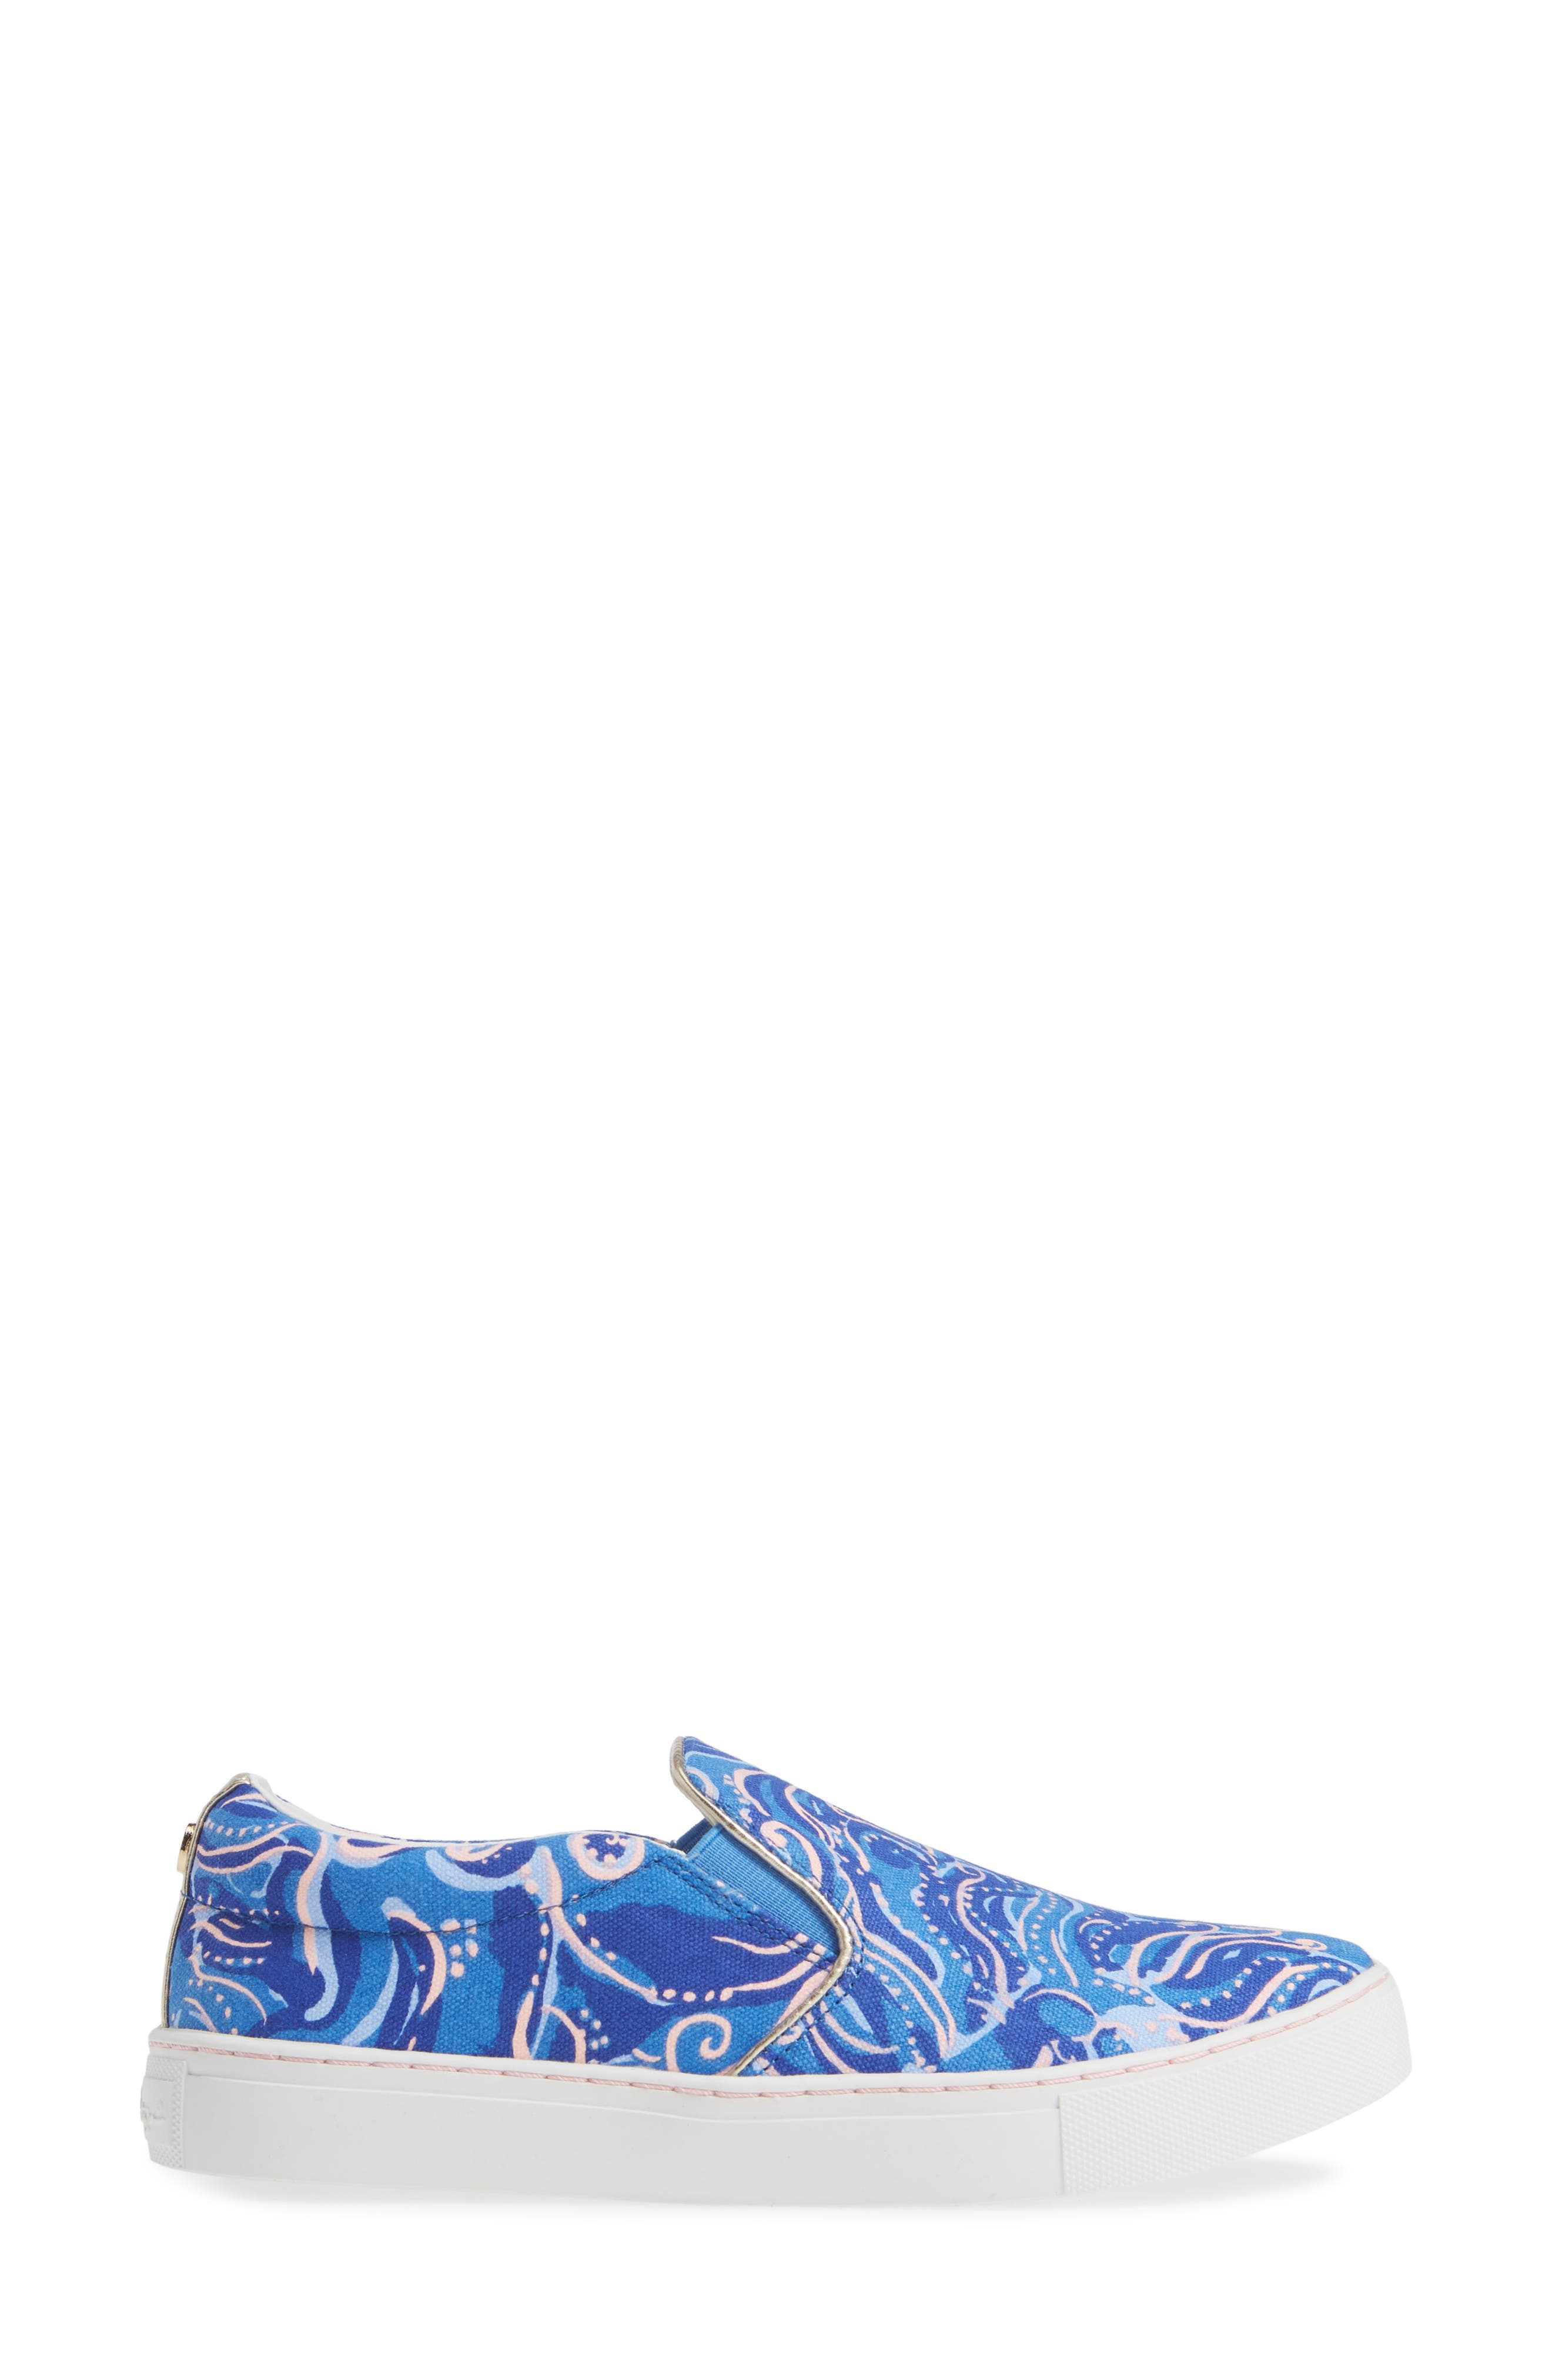 Julie Sneaker,                             Alternate thumbnail 3, color,                             COASTAL BLUE